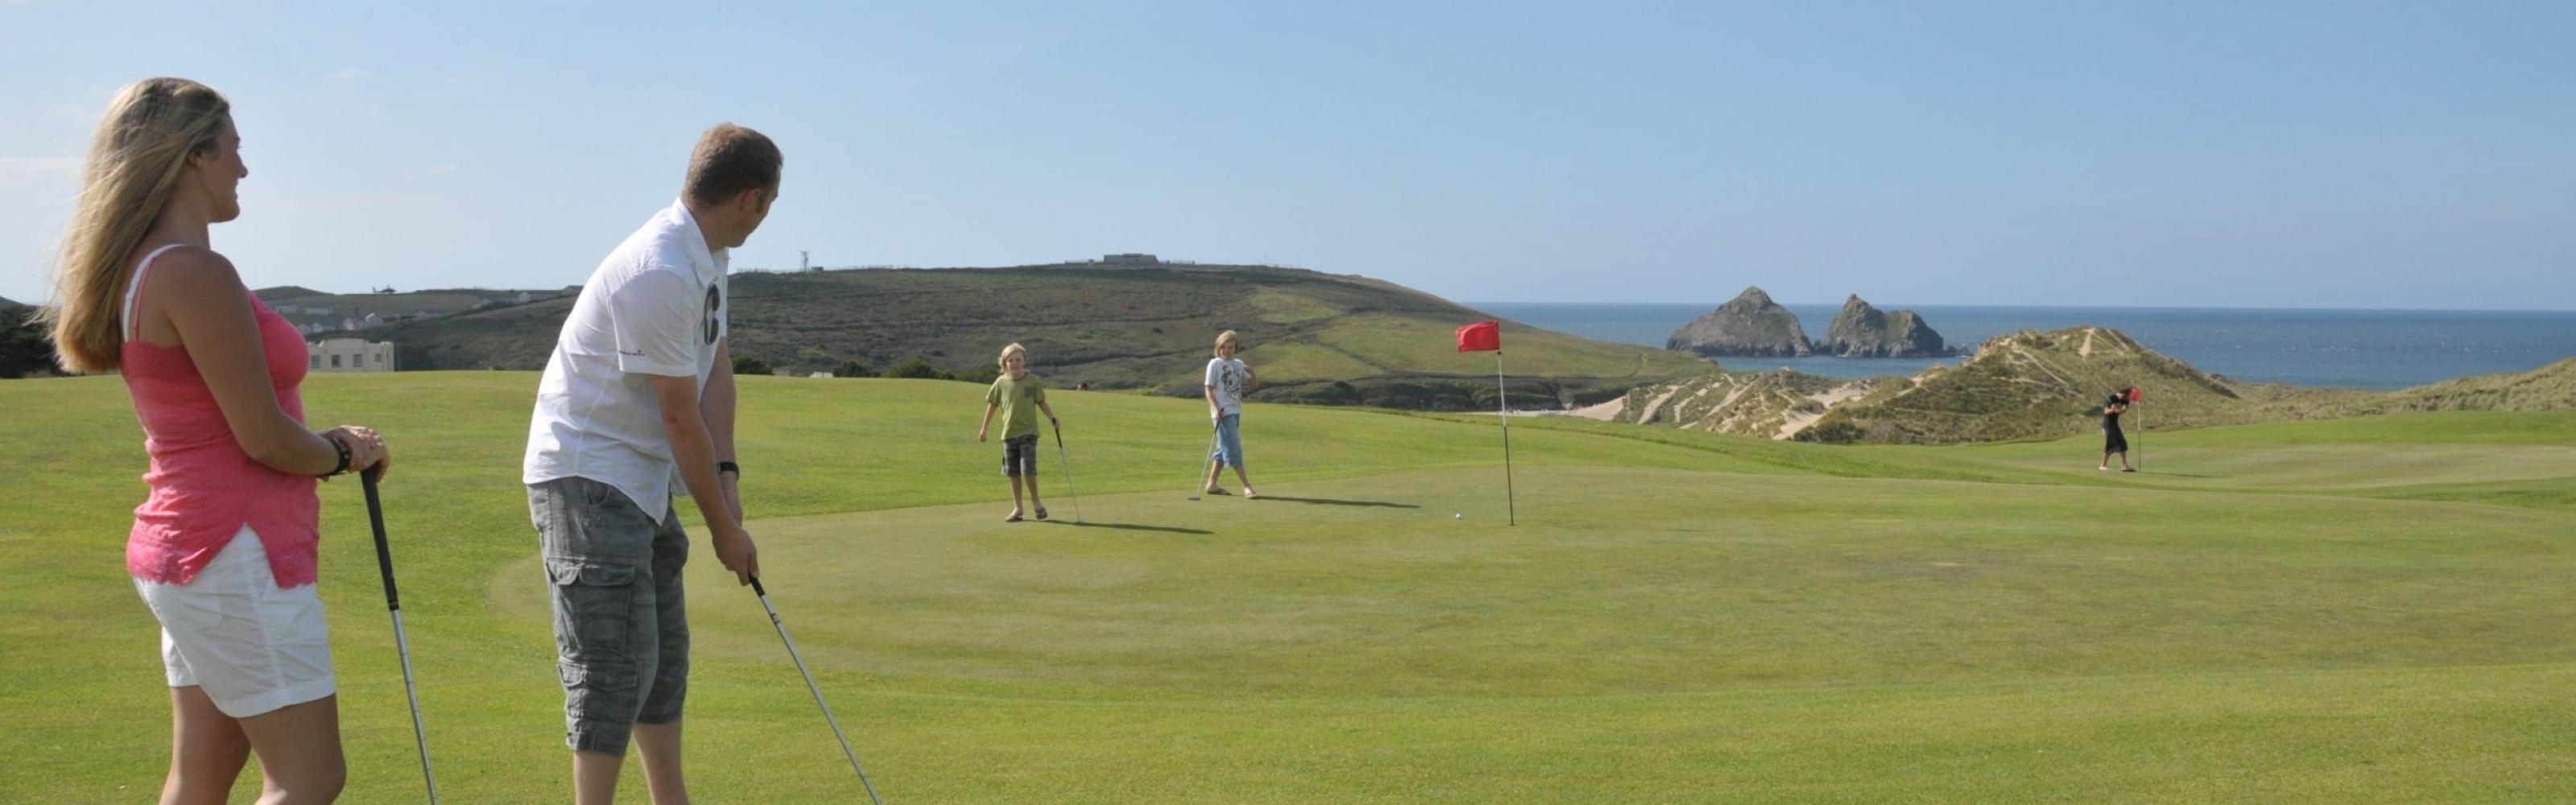 Holywell Bay Golf Club Homepage Banner